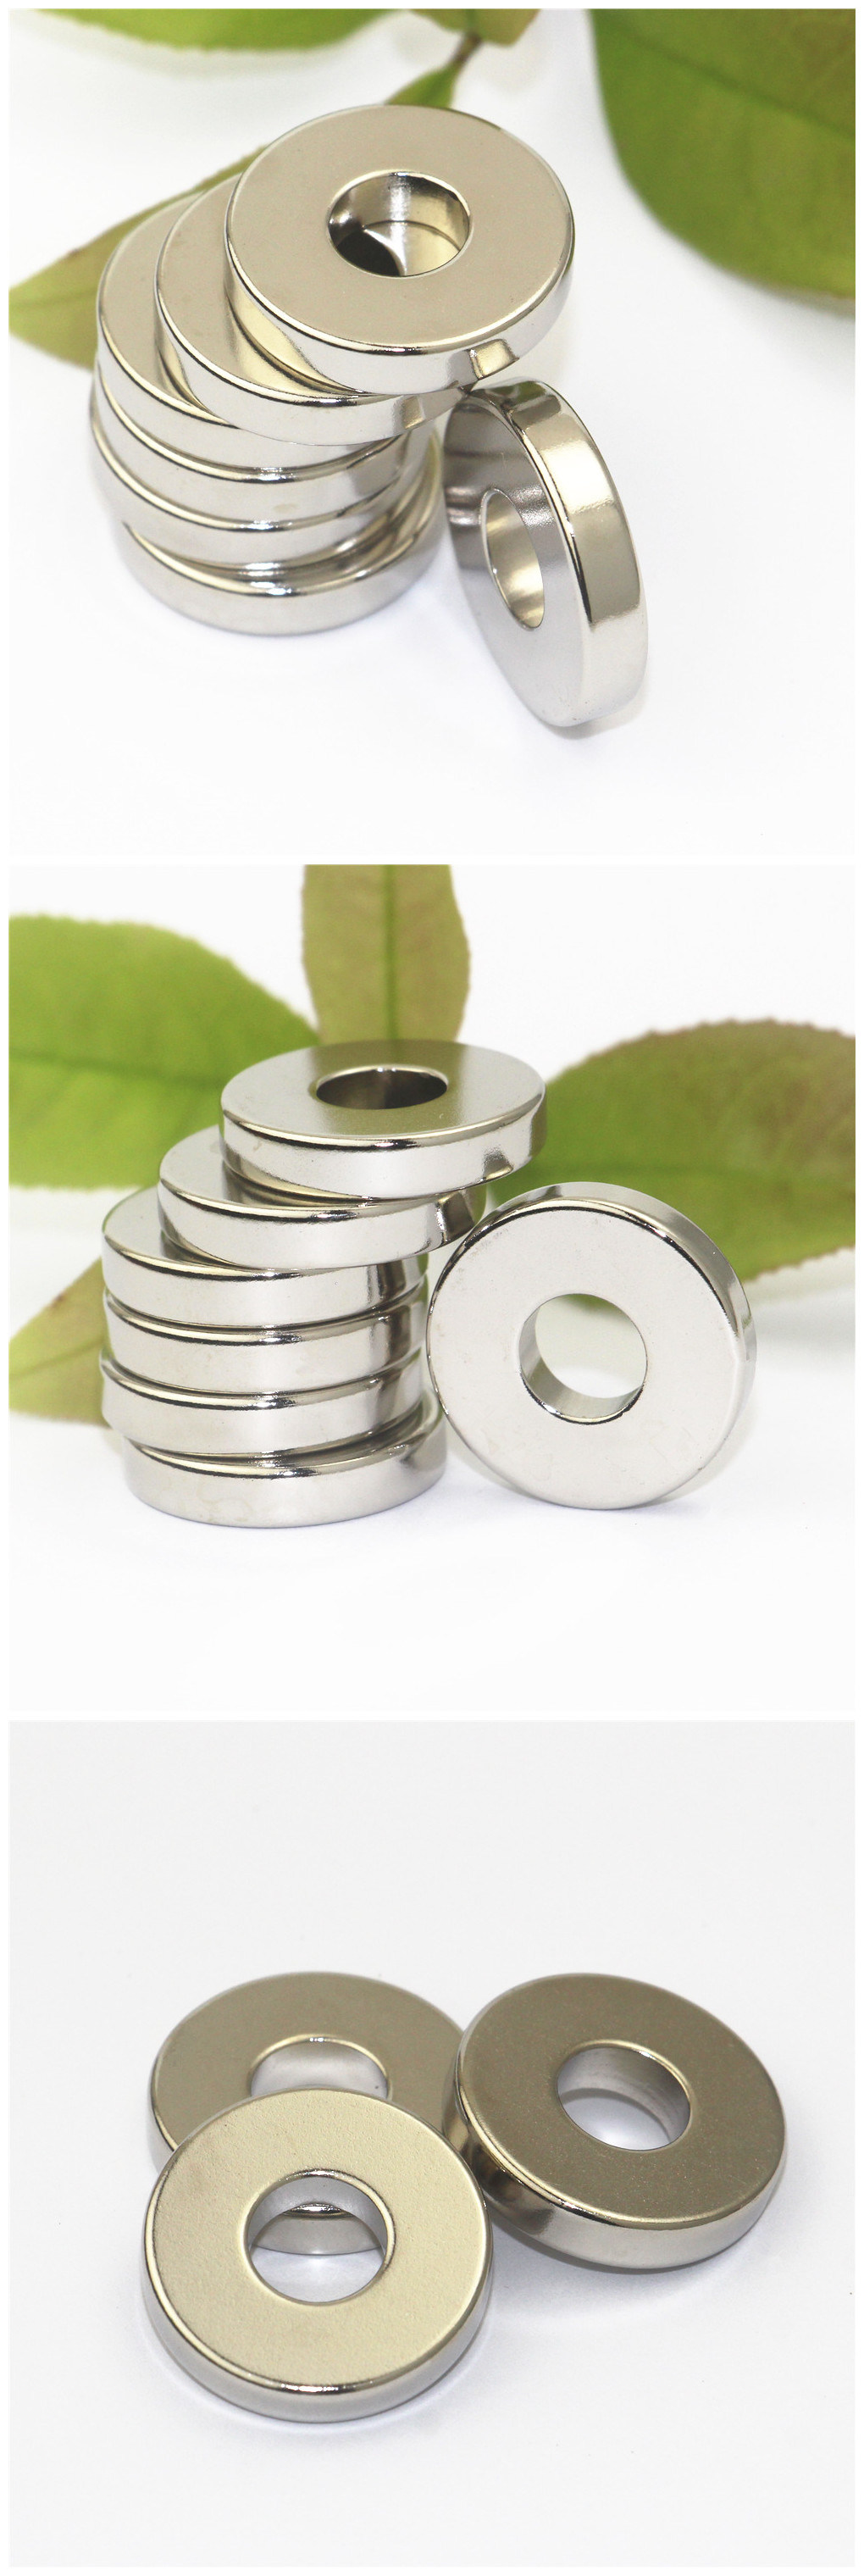 Ring Permanent Neodymium Magnet with Hole Nickel Coating